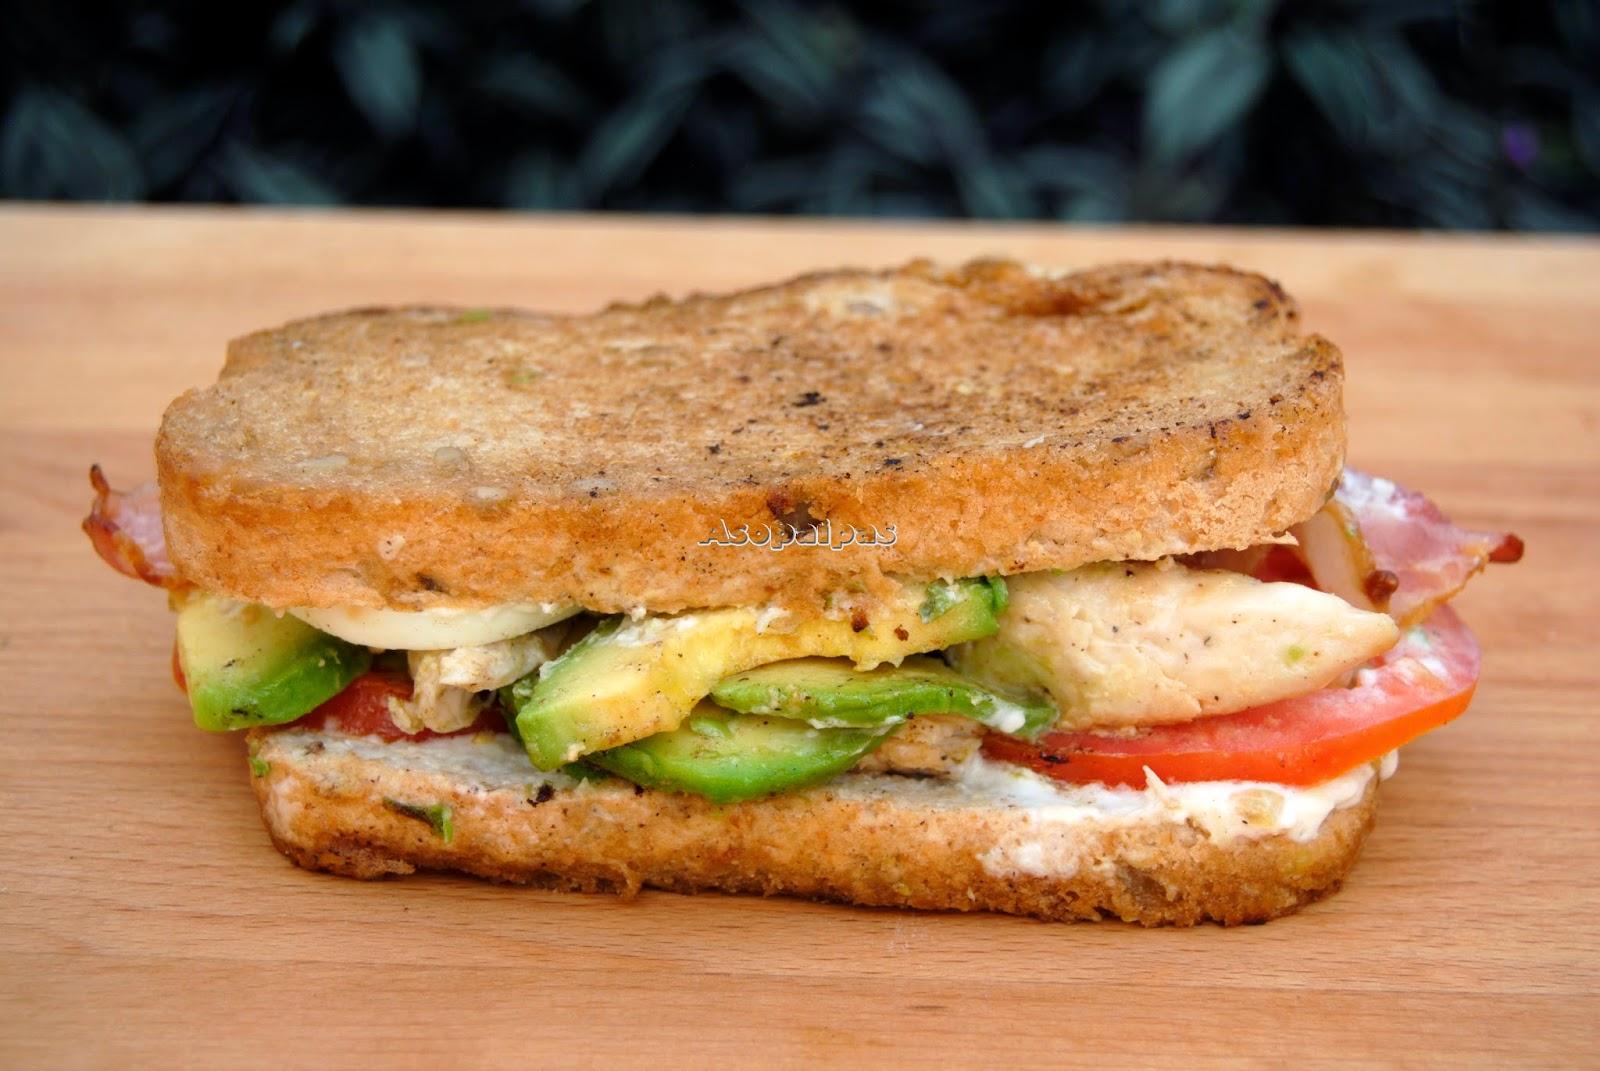 Sándwich Ensalada Cobb (Cobb Salad Sandwich) | Asopaipas. Recetas de ...